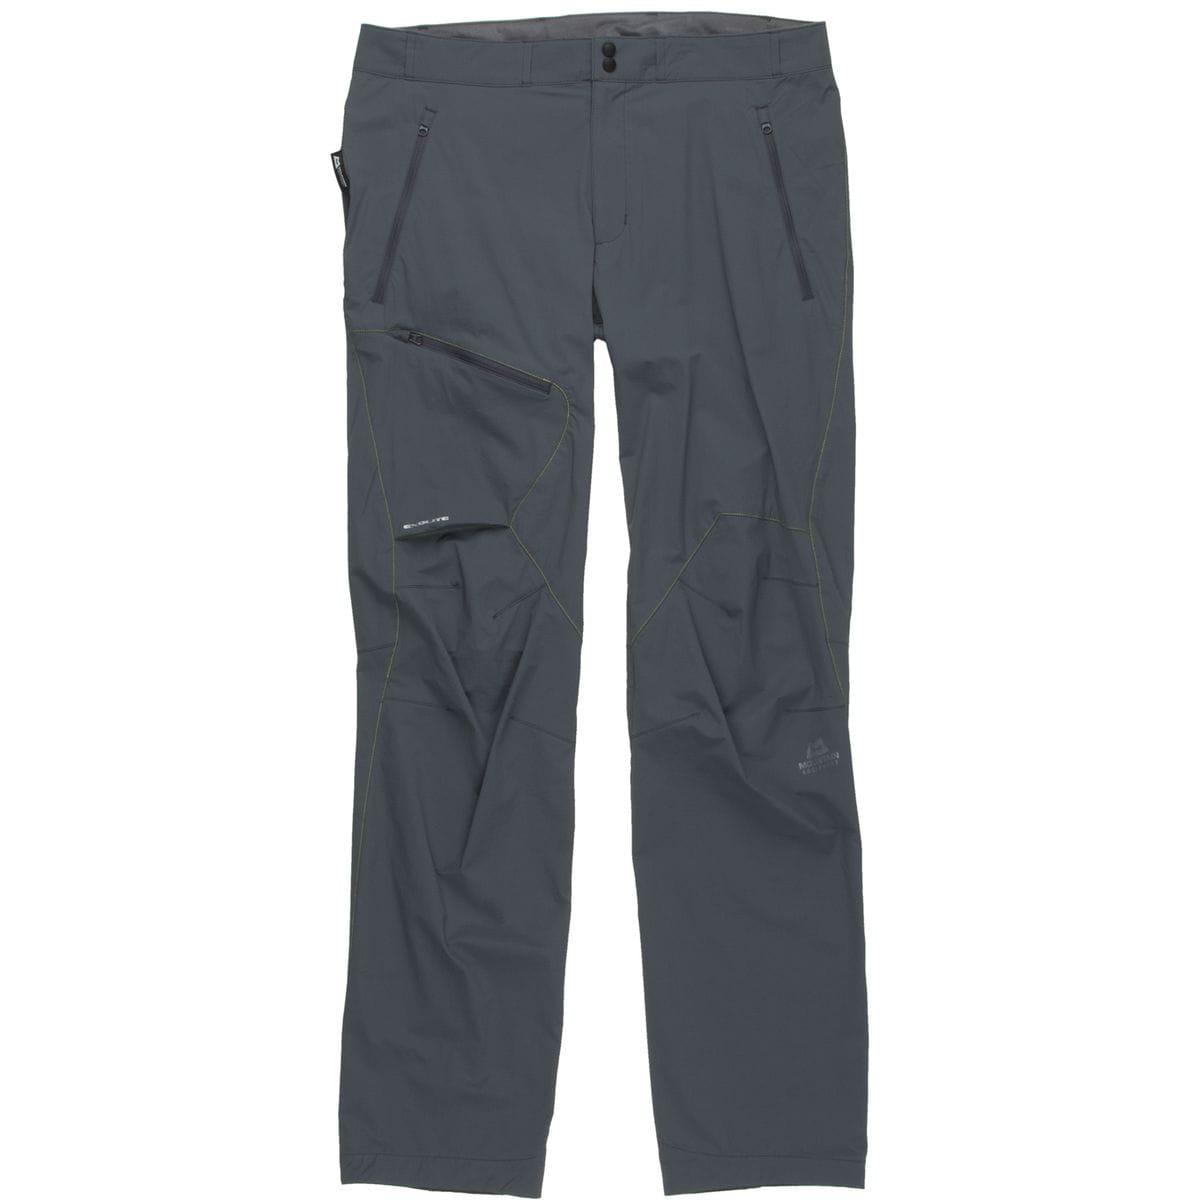 Mountain Equipment Comici Pant - Men